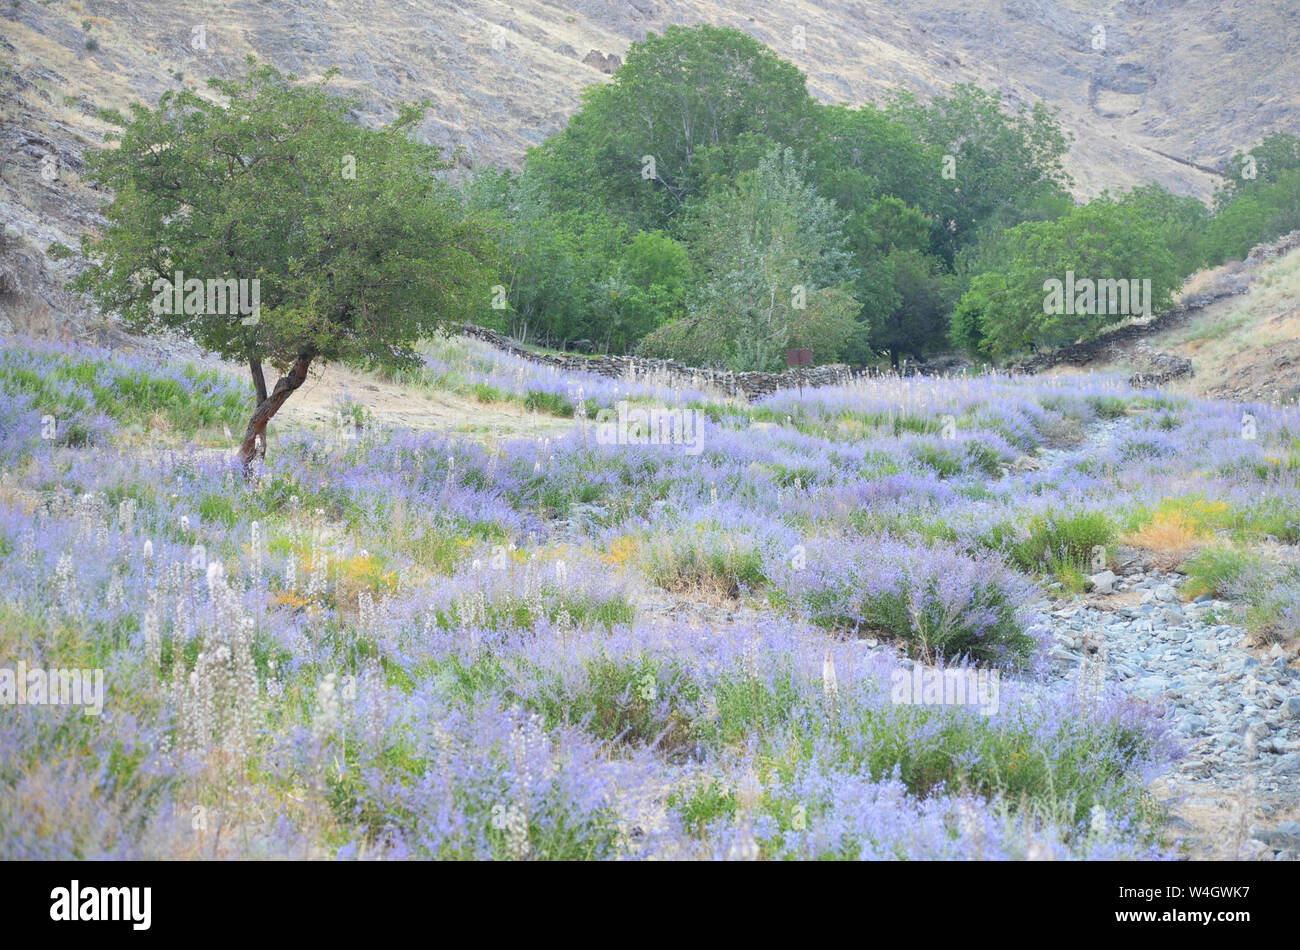 Nuratau-Kyzylkum Biosphere Reserve, Nuratau mountains, Central Uzbekistan Stock Photo